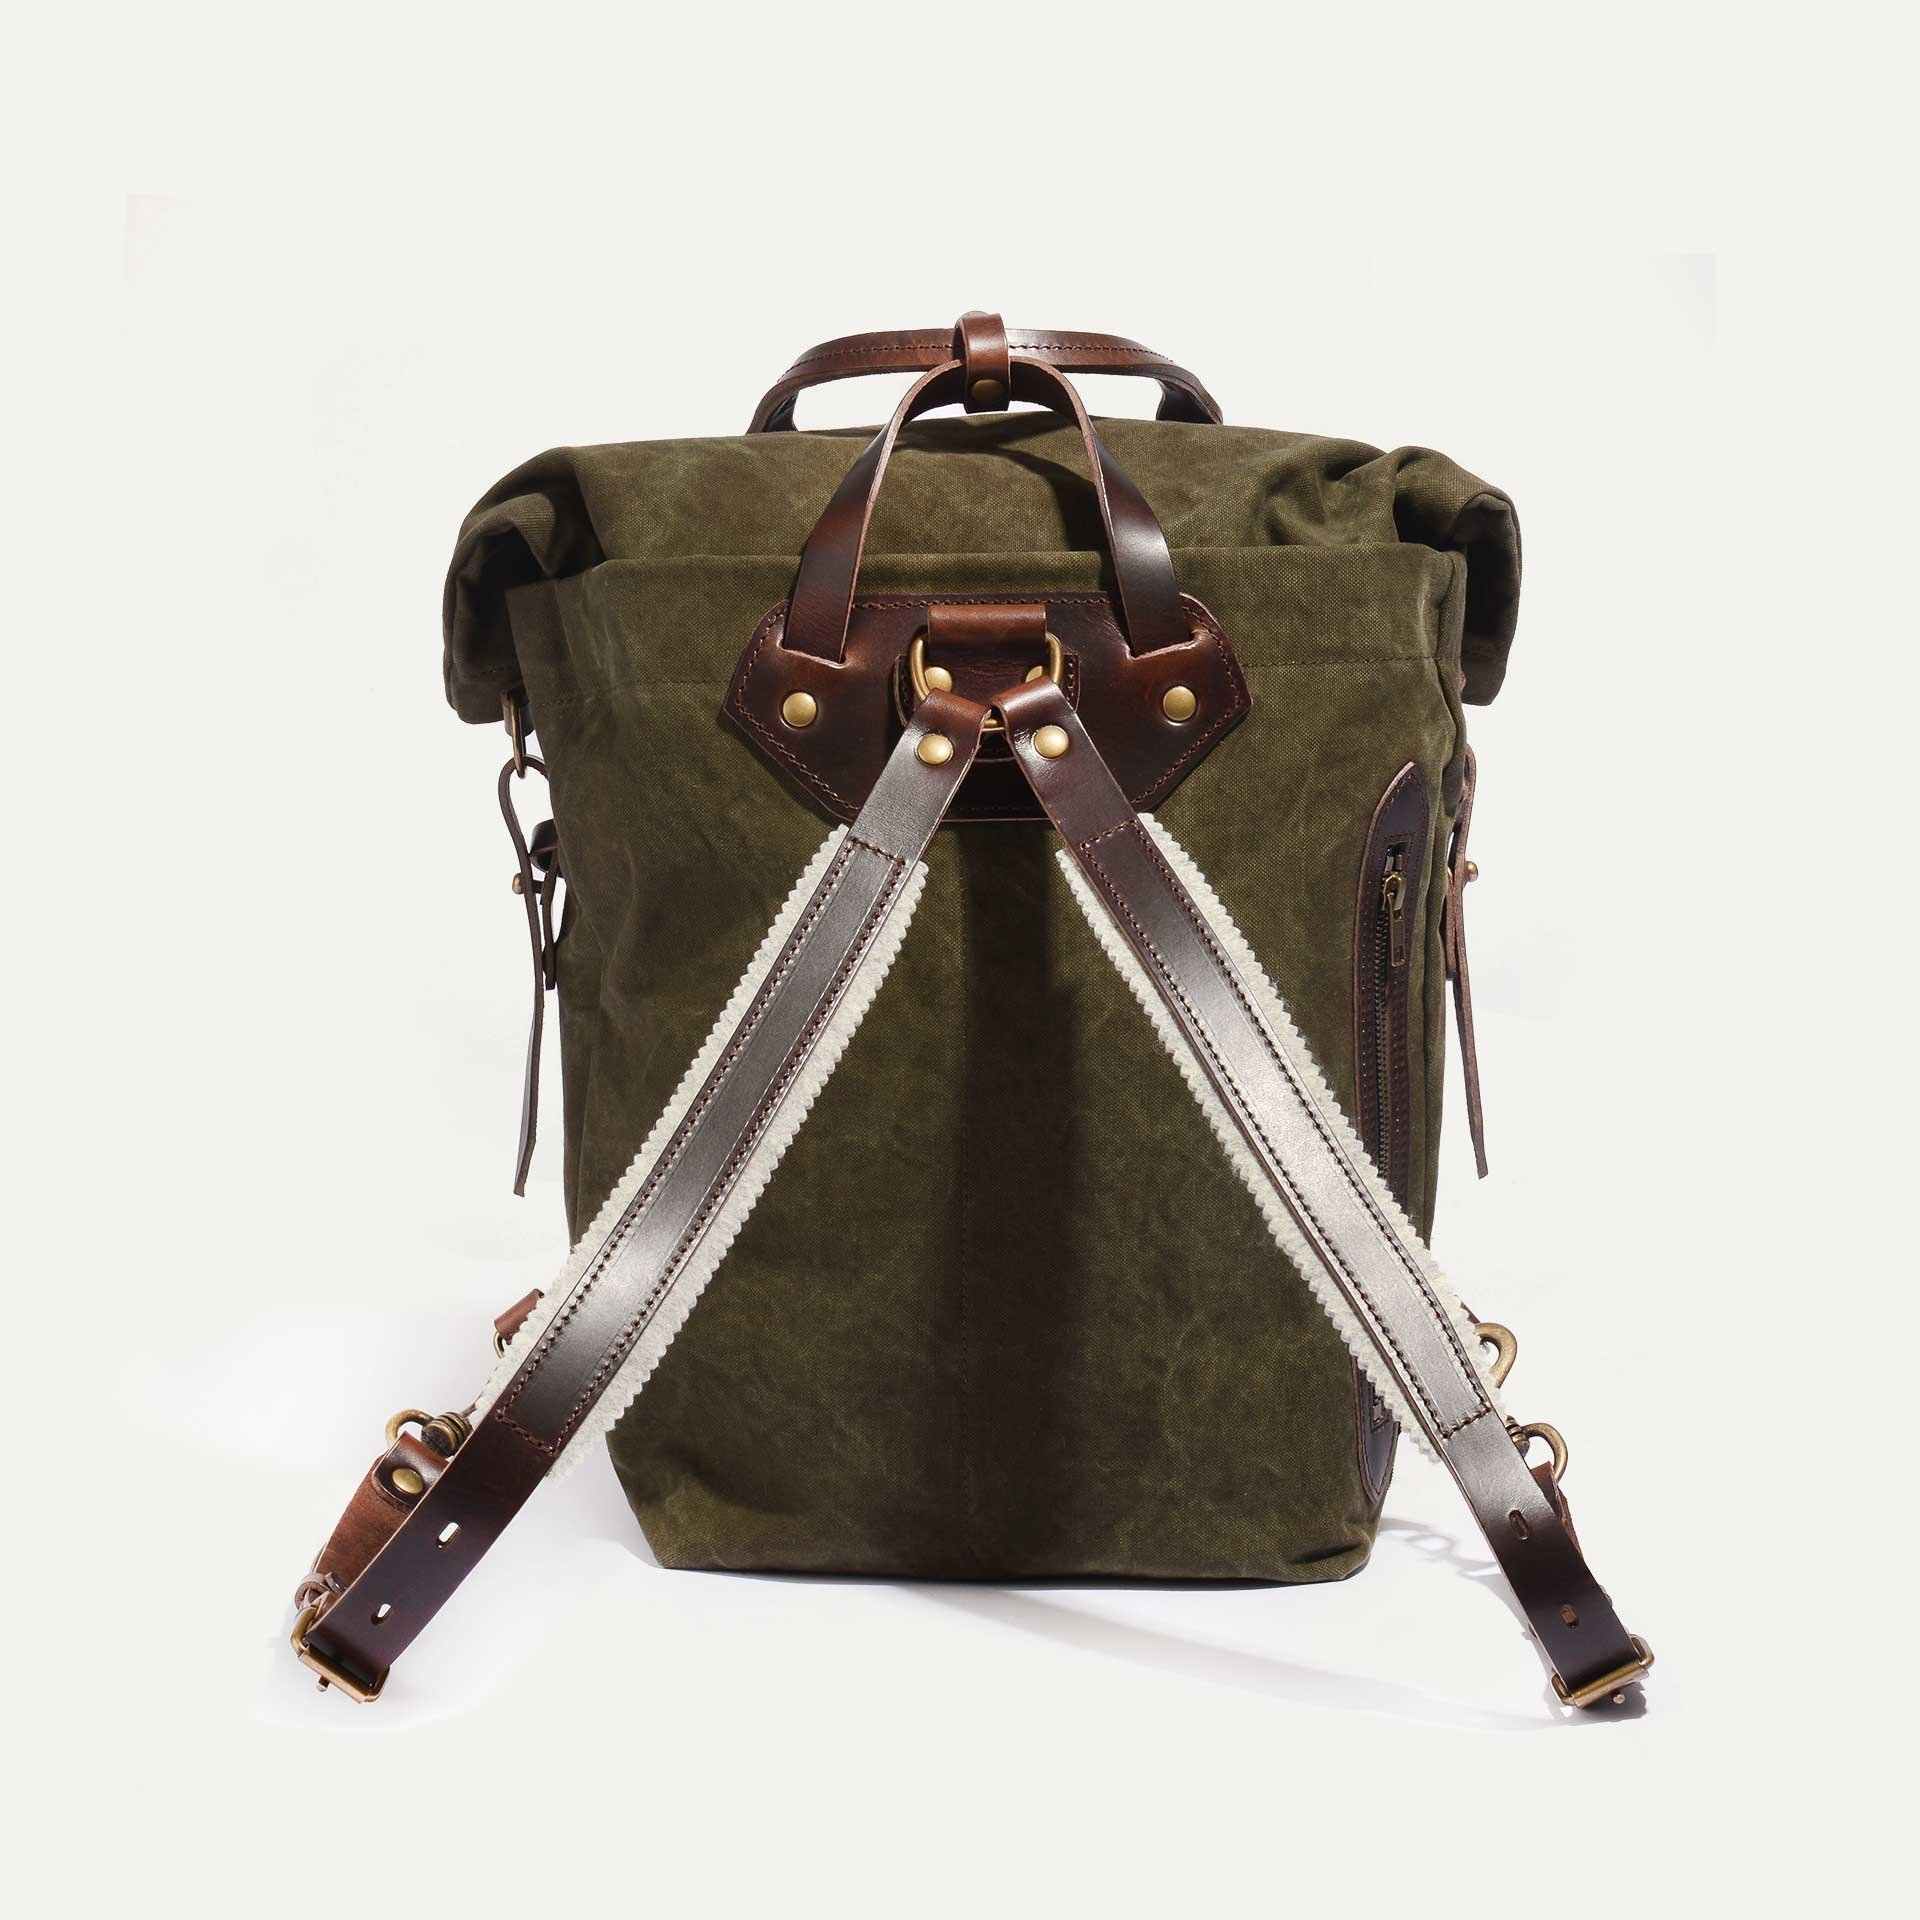 Woody S Backpack - Dark Khaki  (image n°3)